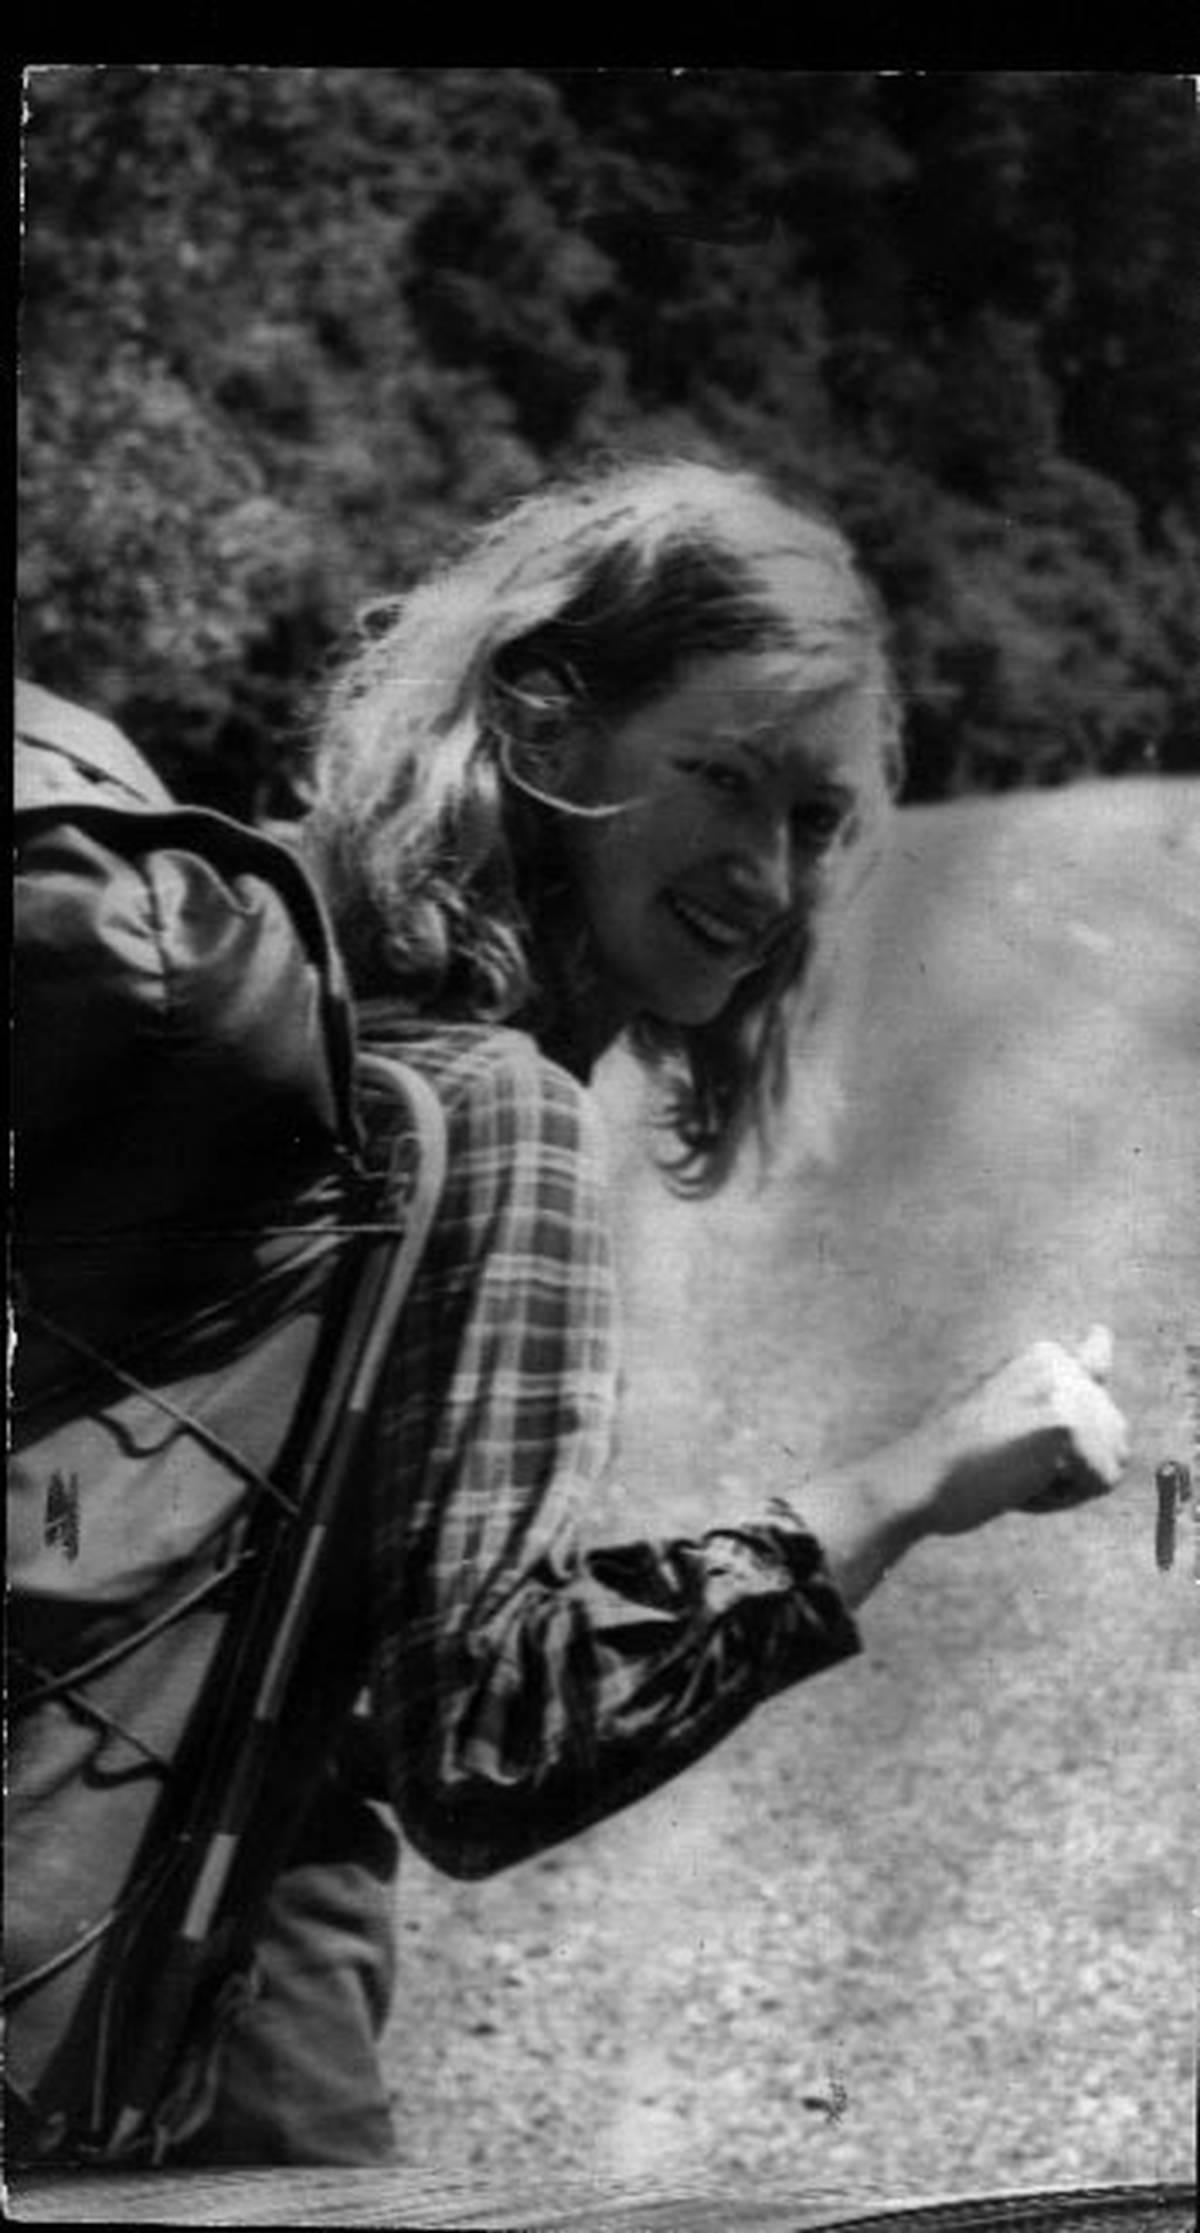 The 50 Year Secret: Police failed to investigate Jennifer Beard murder report